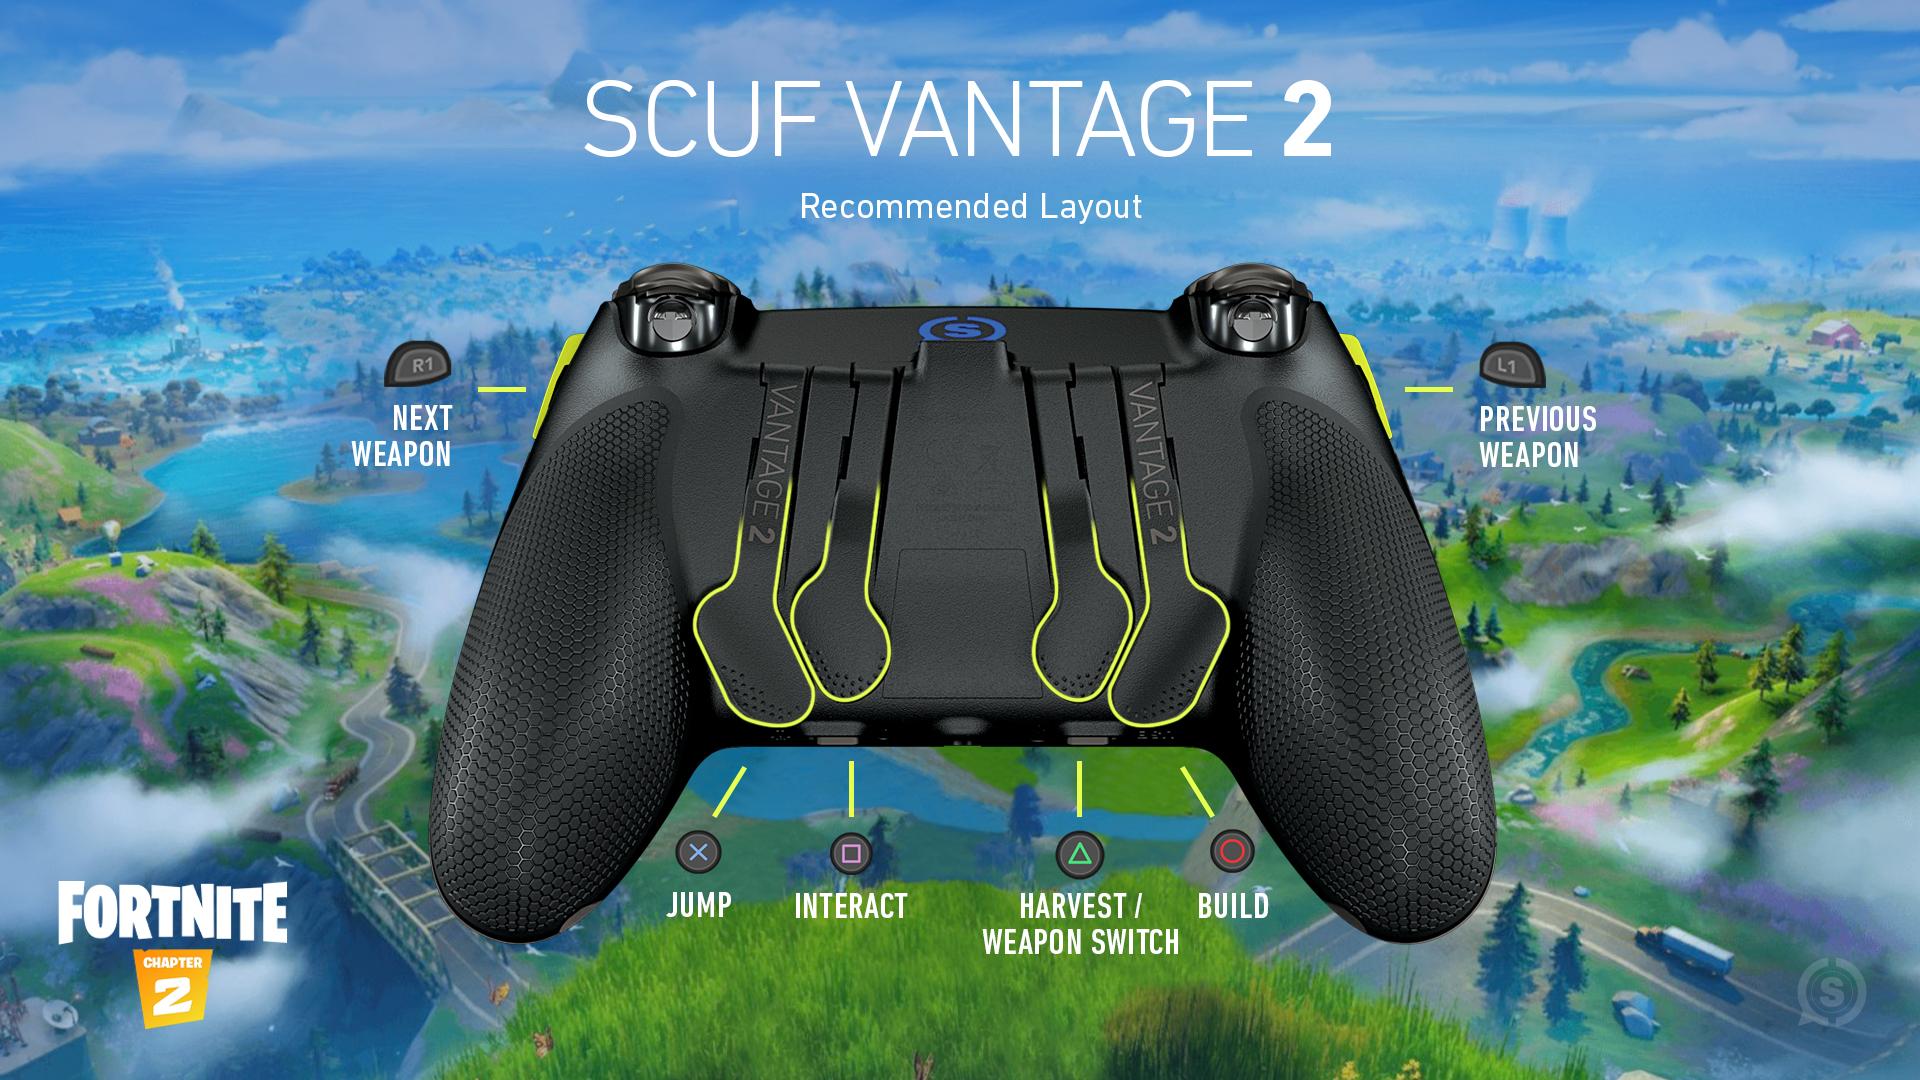 SCUF Vantage 2 Fortnite PS4 Controller Set Up